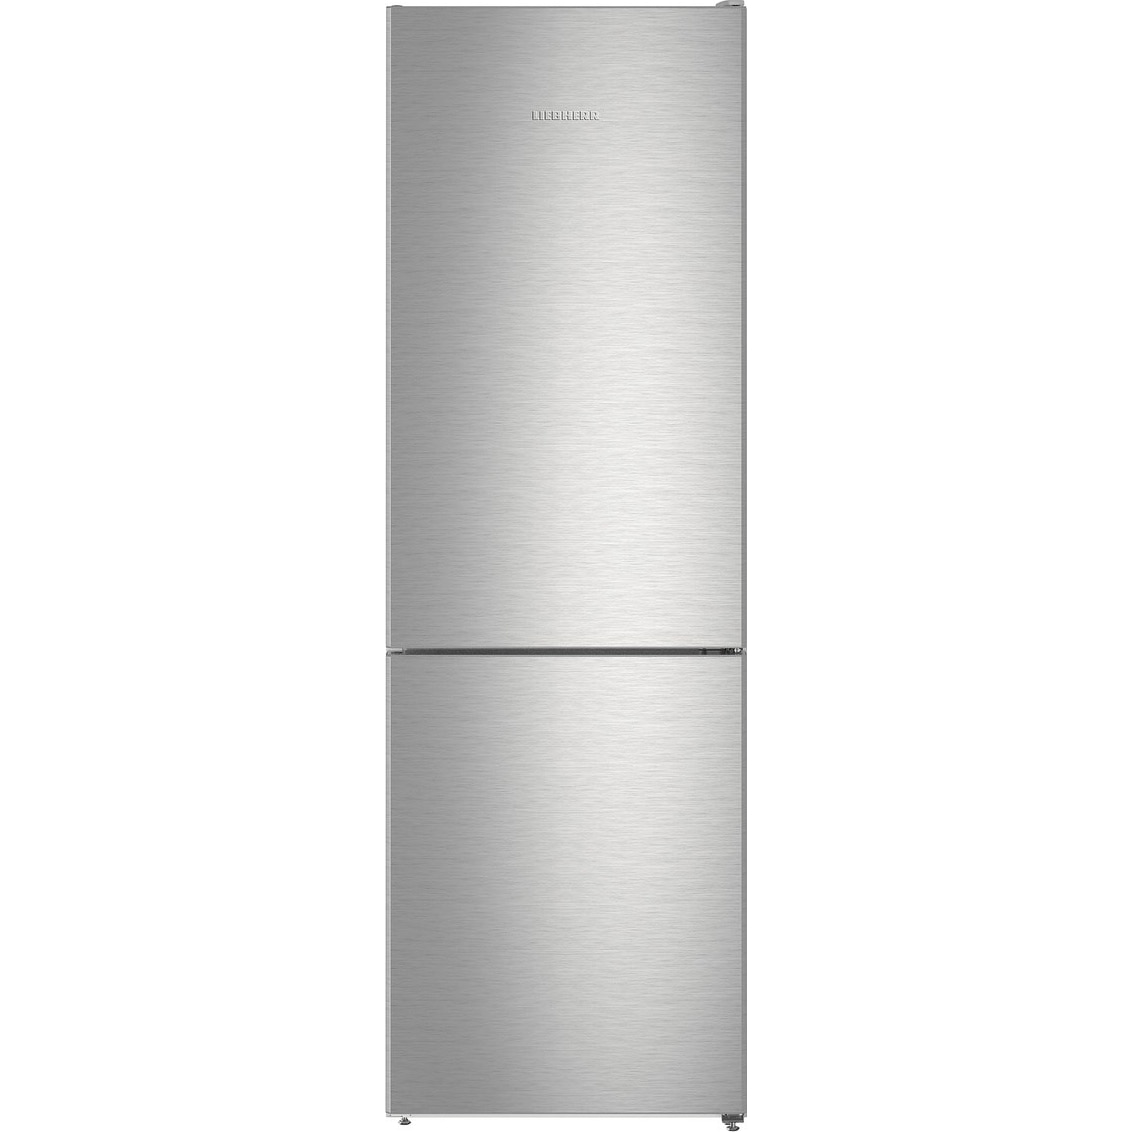 Fotografie Combina frigorifica LIEBHERR CNPef 4313, No Frost, 304 l, H 186 cm, Clasa A+++, Inox antiamprenta